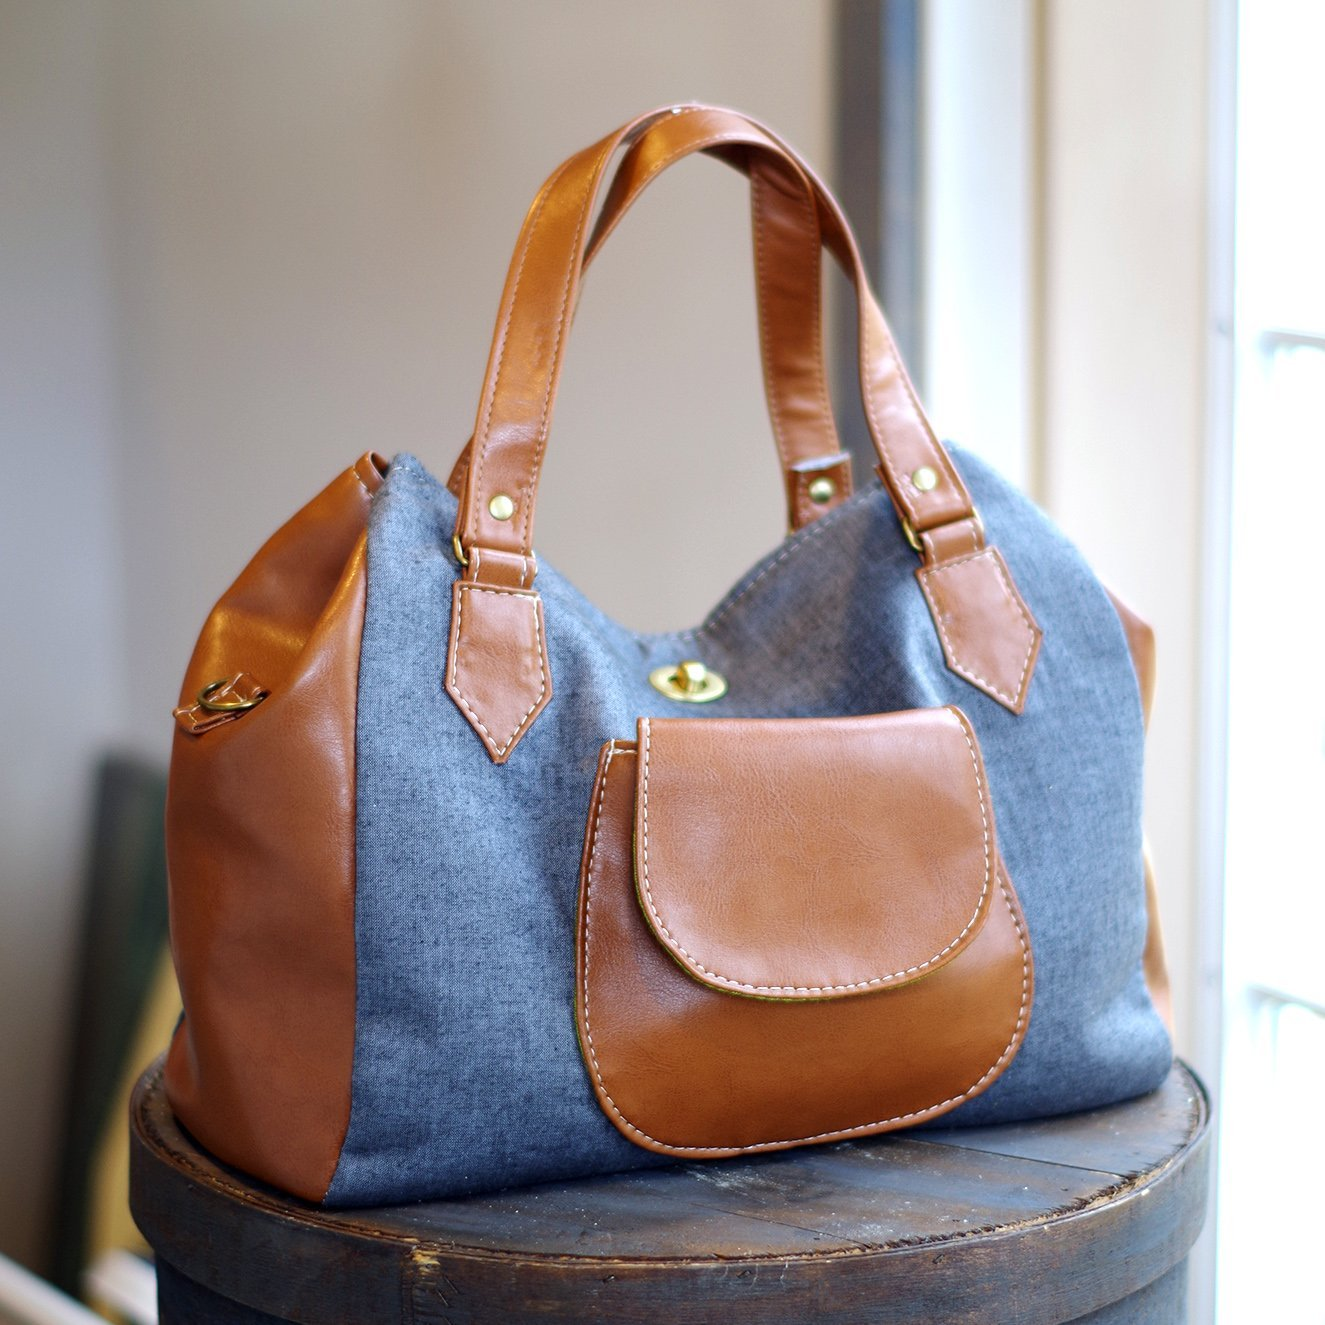 Frankie Handbag Tote Acrylic Templates